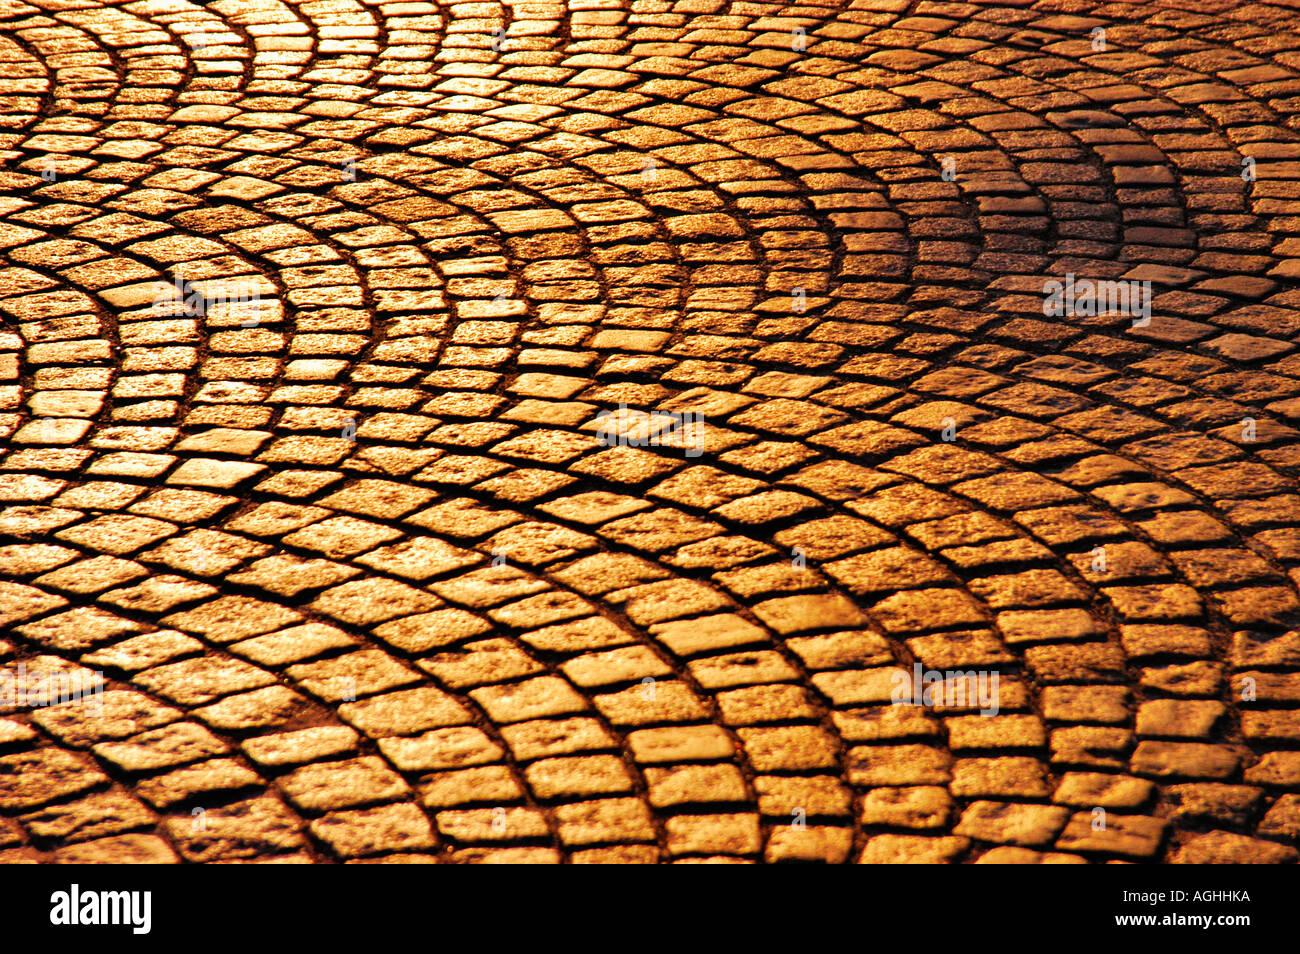 cobblestoned street, Stockholm, Sweden - Stock Image